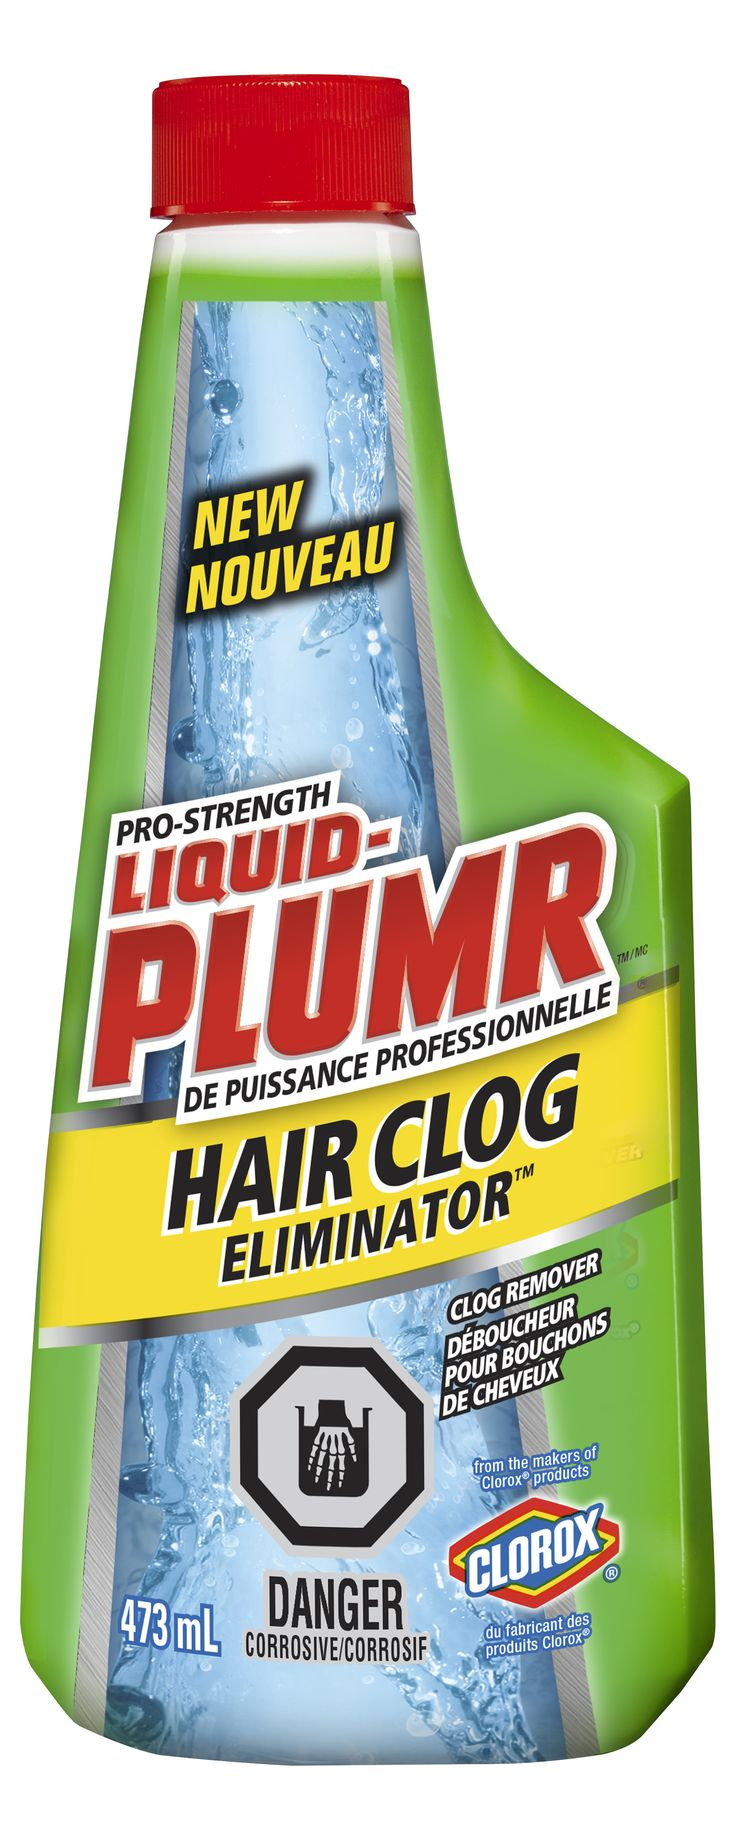 THE CLOROX COMPANY OF CANADA, LTD. / LIQUID-PLUMR®  - Hair Clog Eliminator™